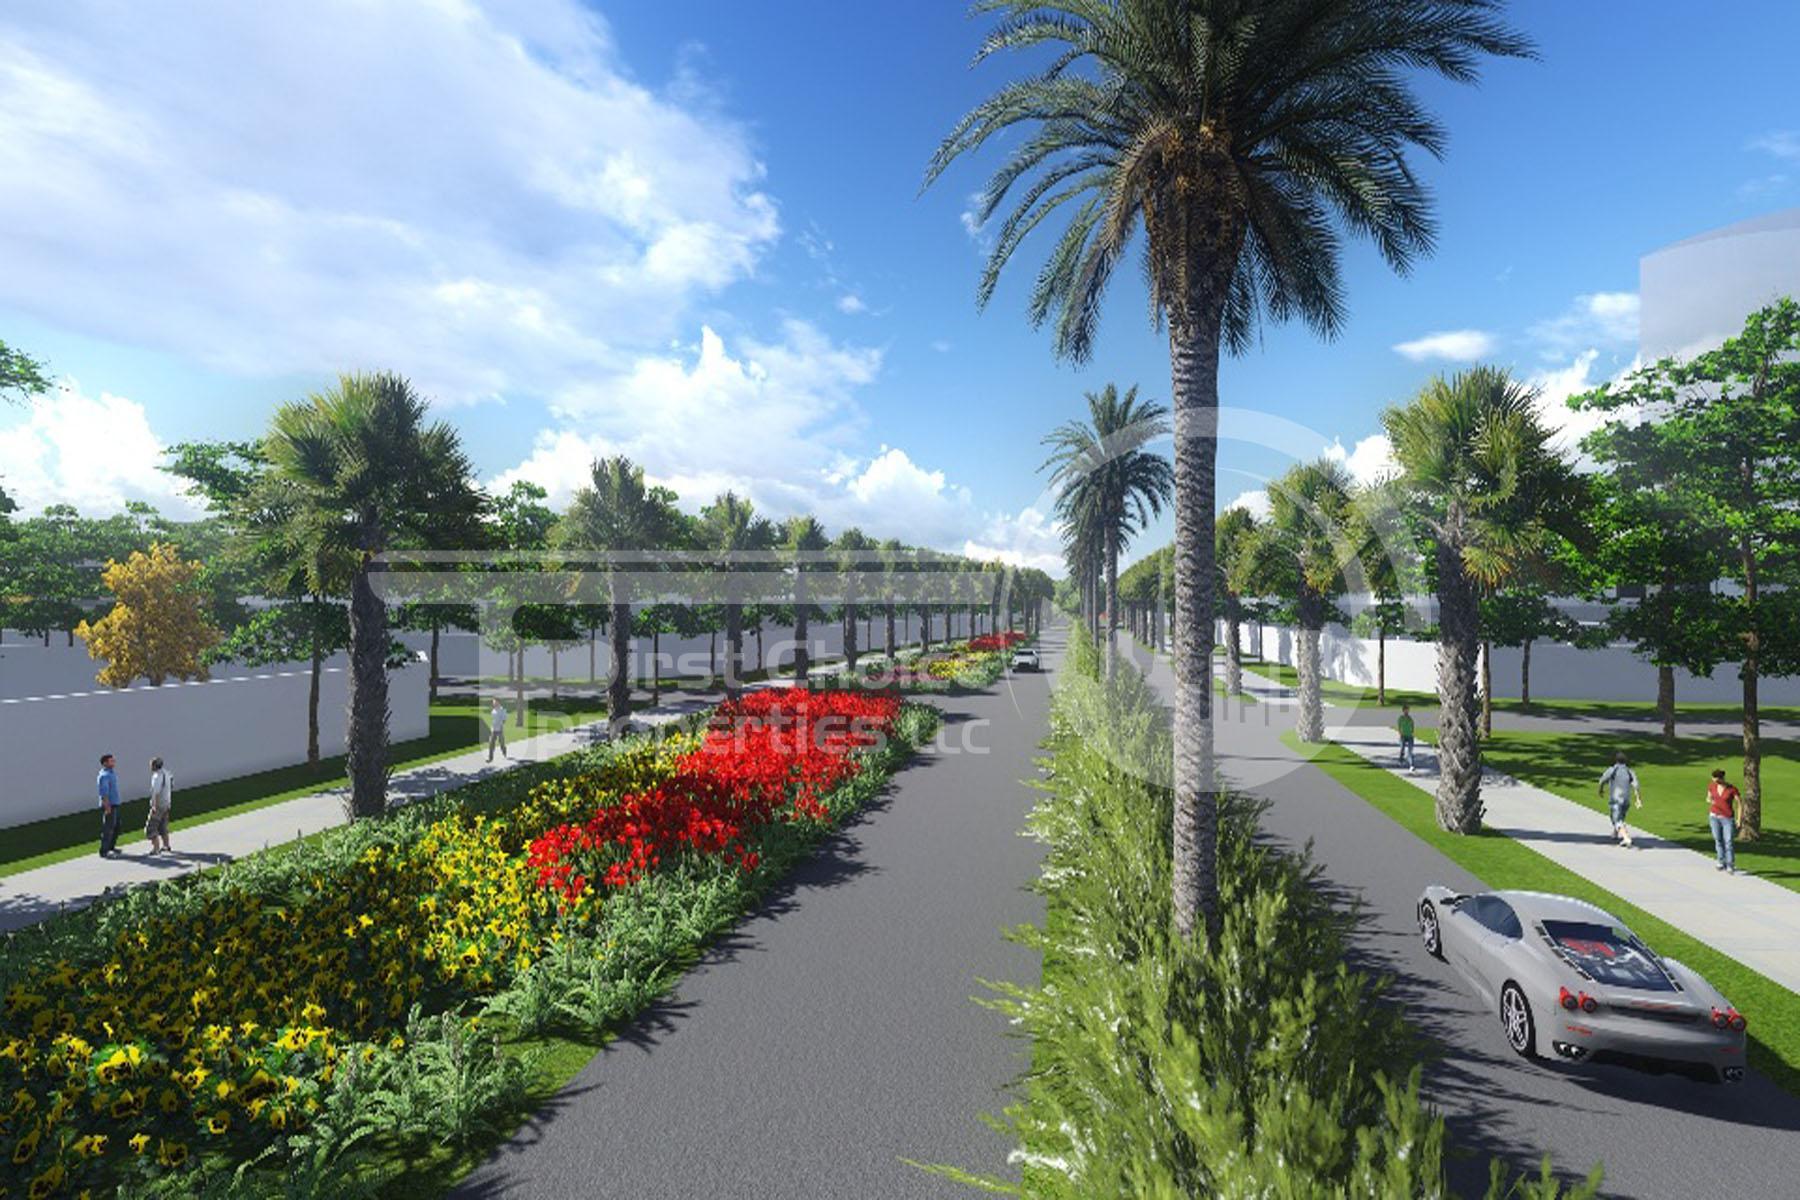 Residential Island - Nareel Island - Al Bateen - Abu Dhabi - UAE (4).jpg